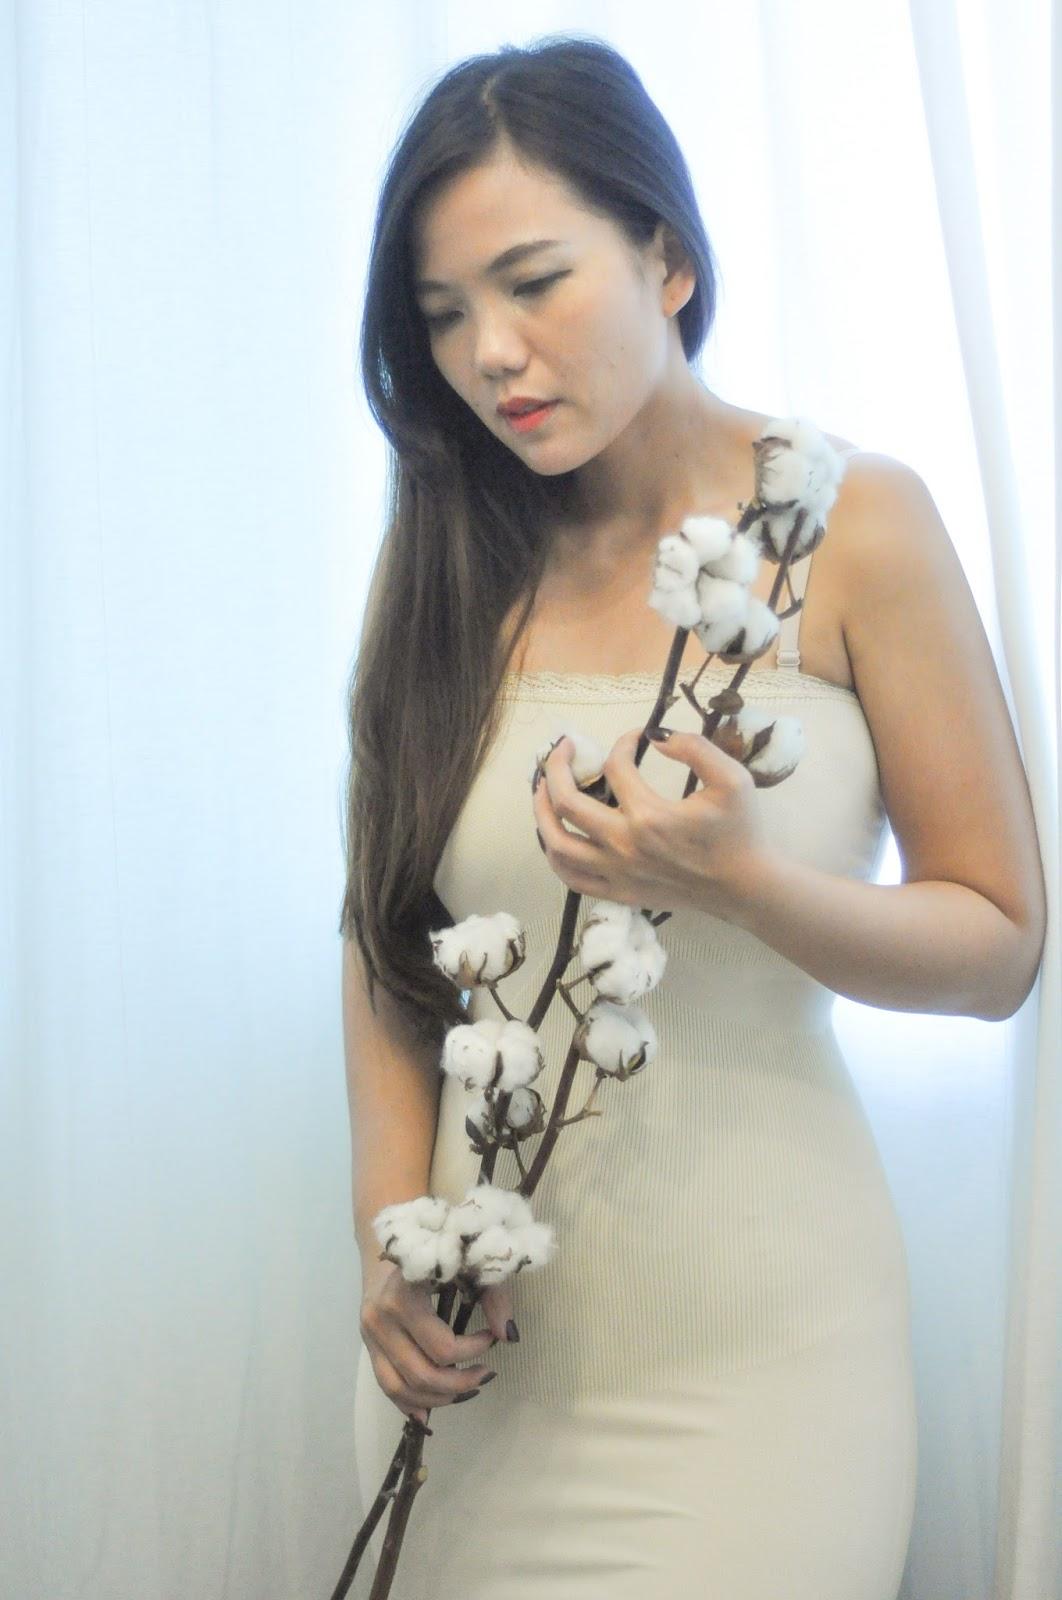 bde5f2e75c353 MD Women s Shapewear Strapless Firm Tummy Control Full Length Slip Body  Shaper in Dark Nude colour.